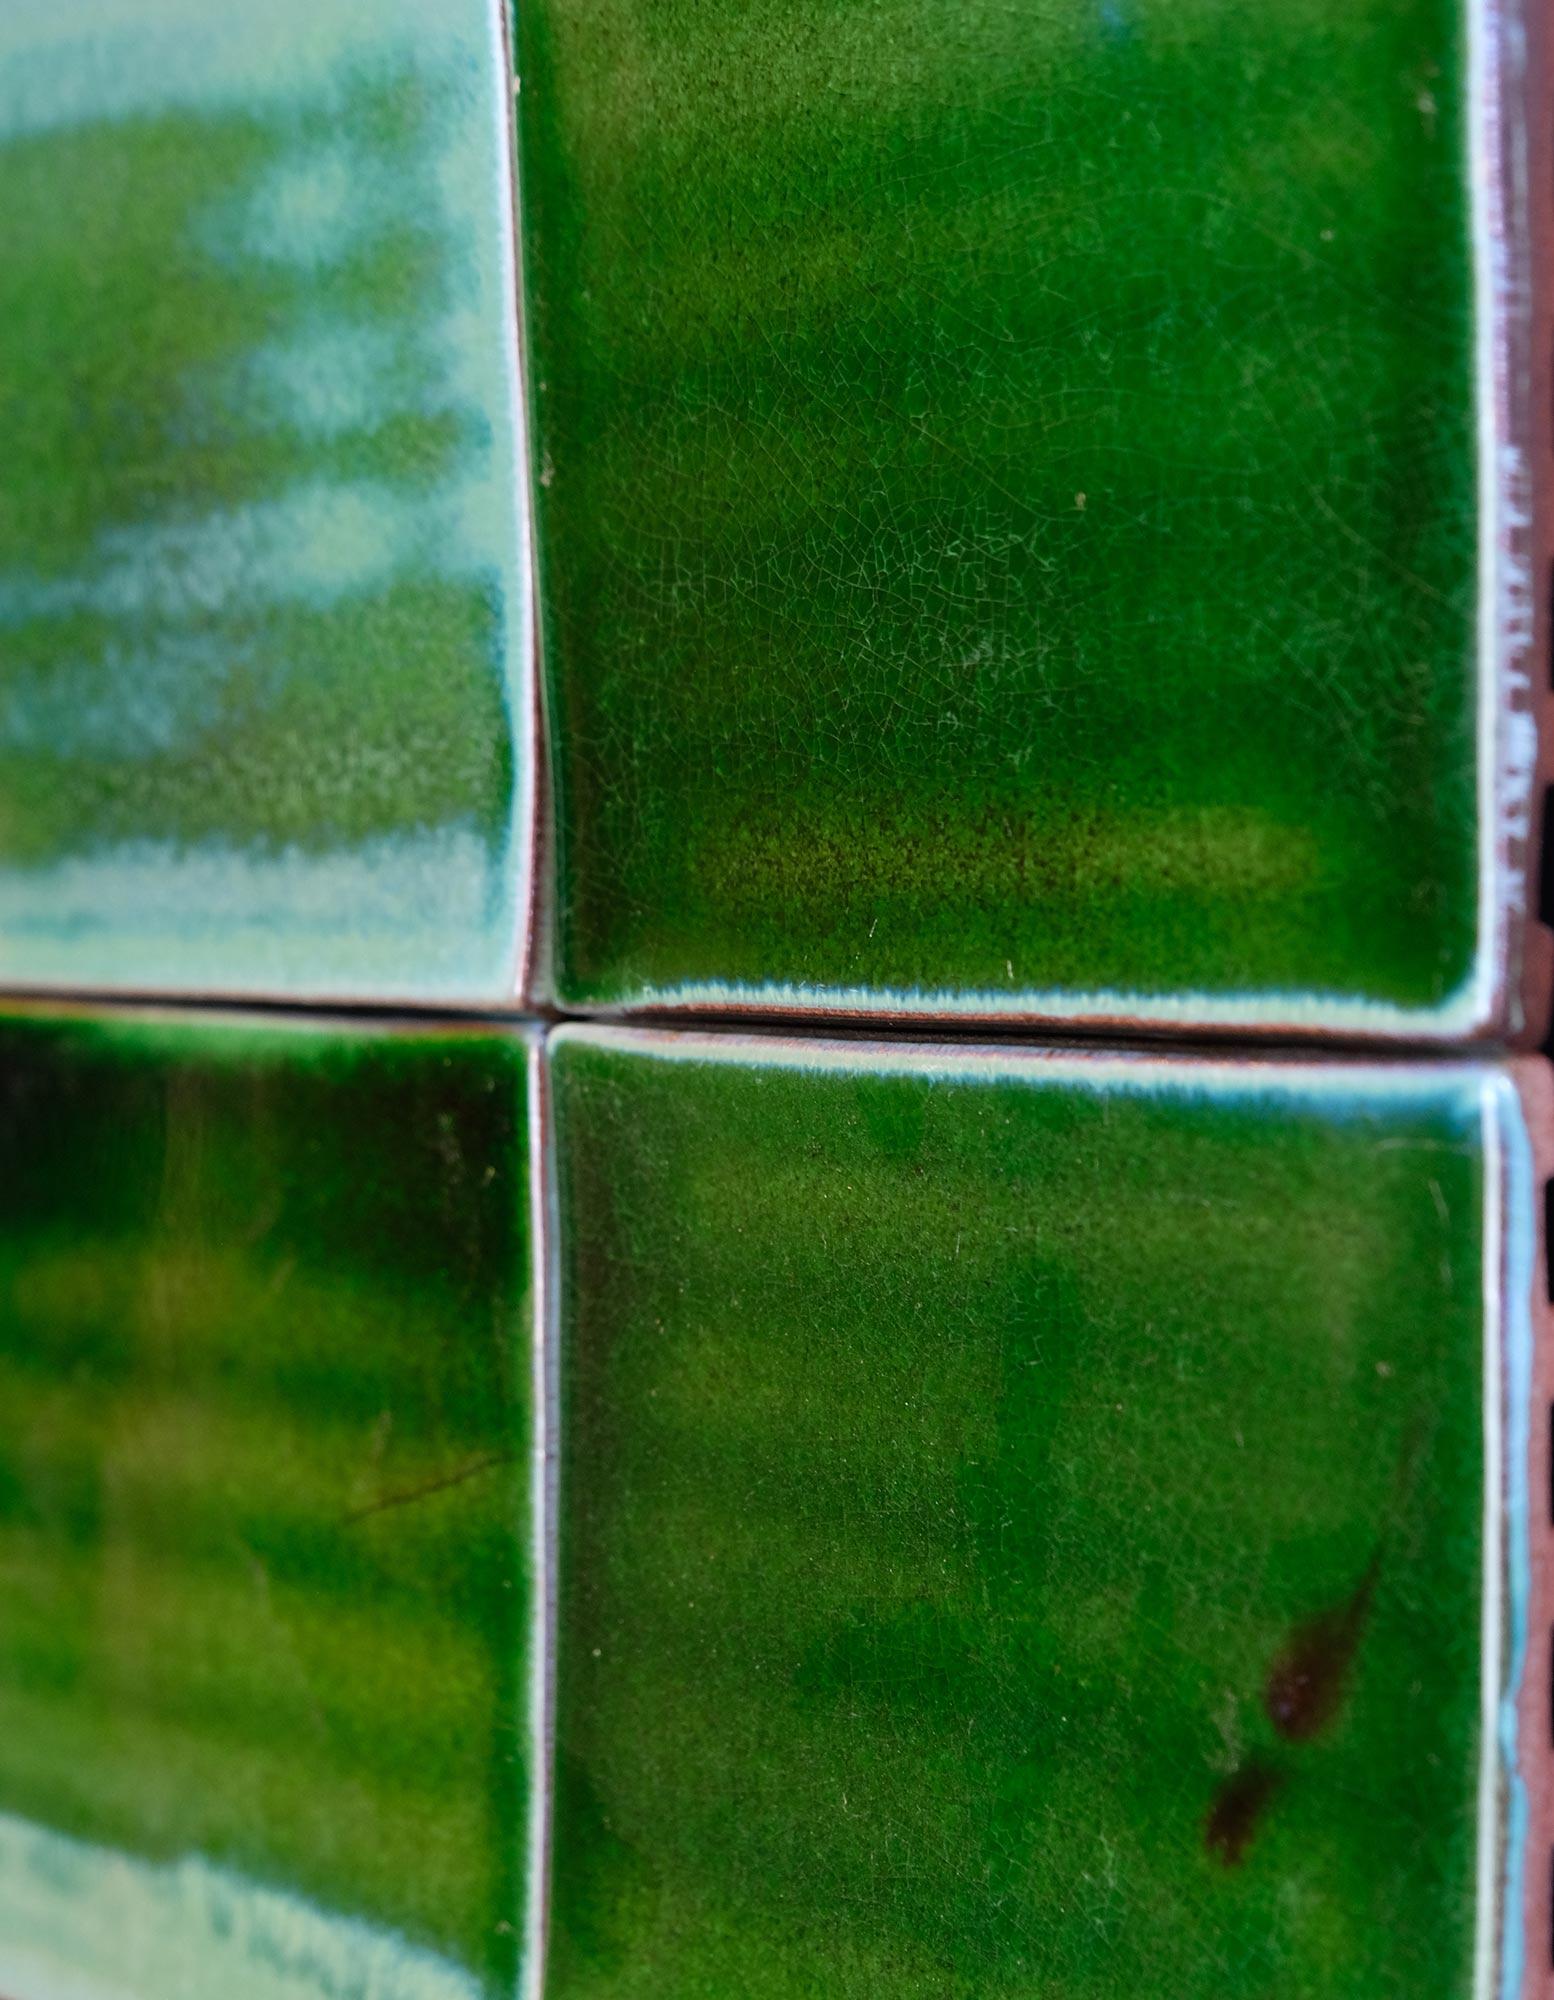 wandpaneele-keramik-wandfliesen-glasiert-java-square-seitlich